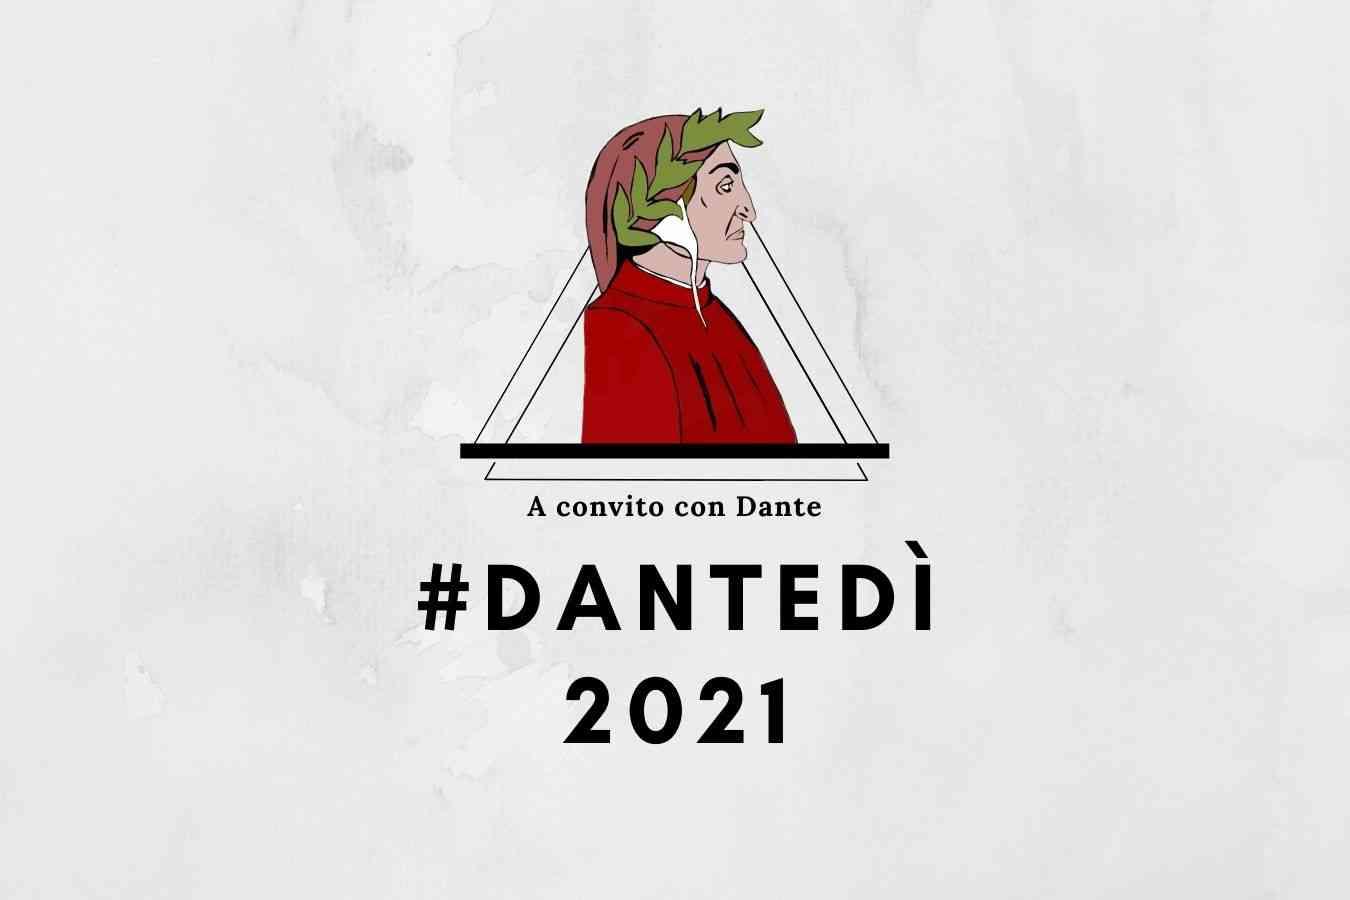 Dantedì: cucina medioevale con Dante Alighieri.